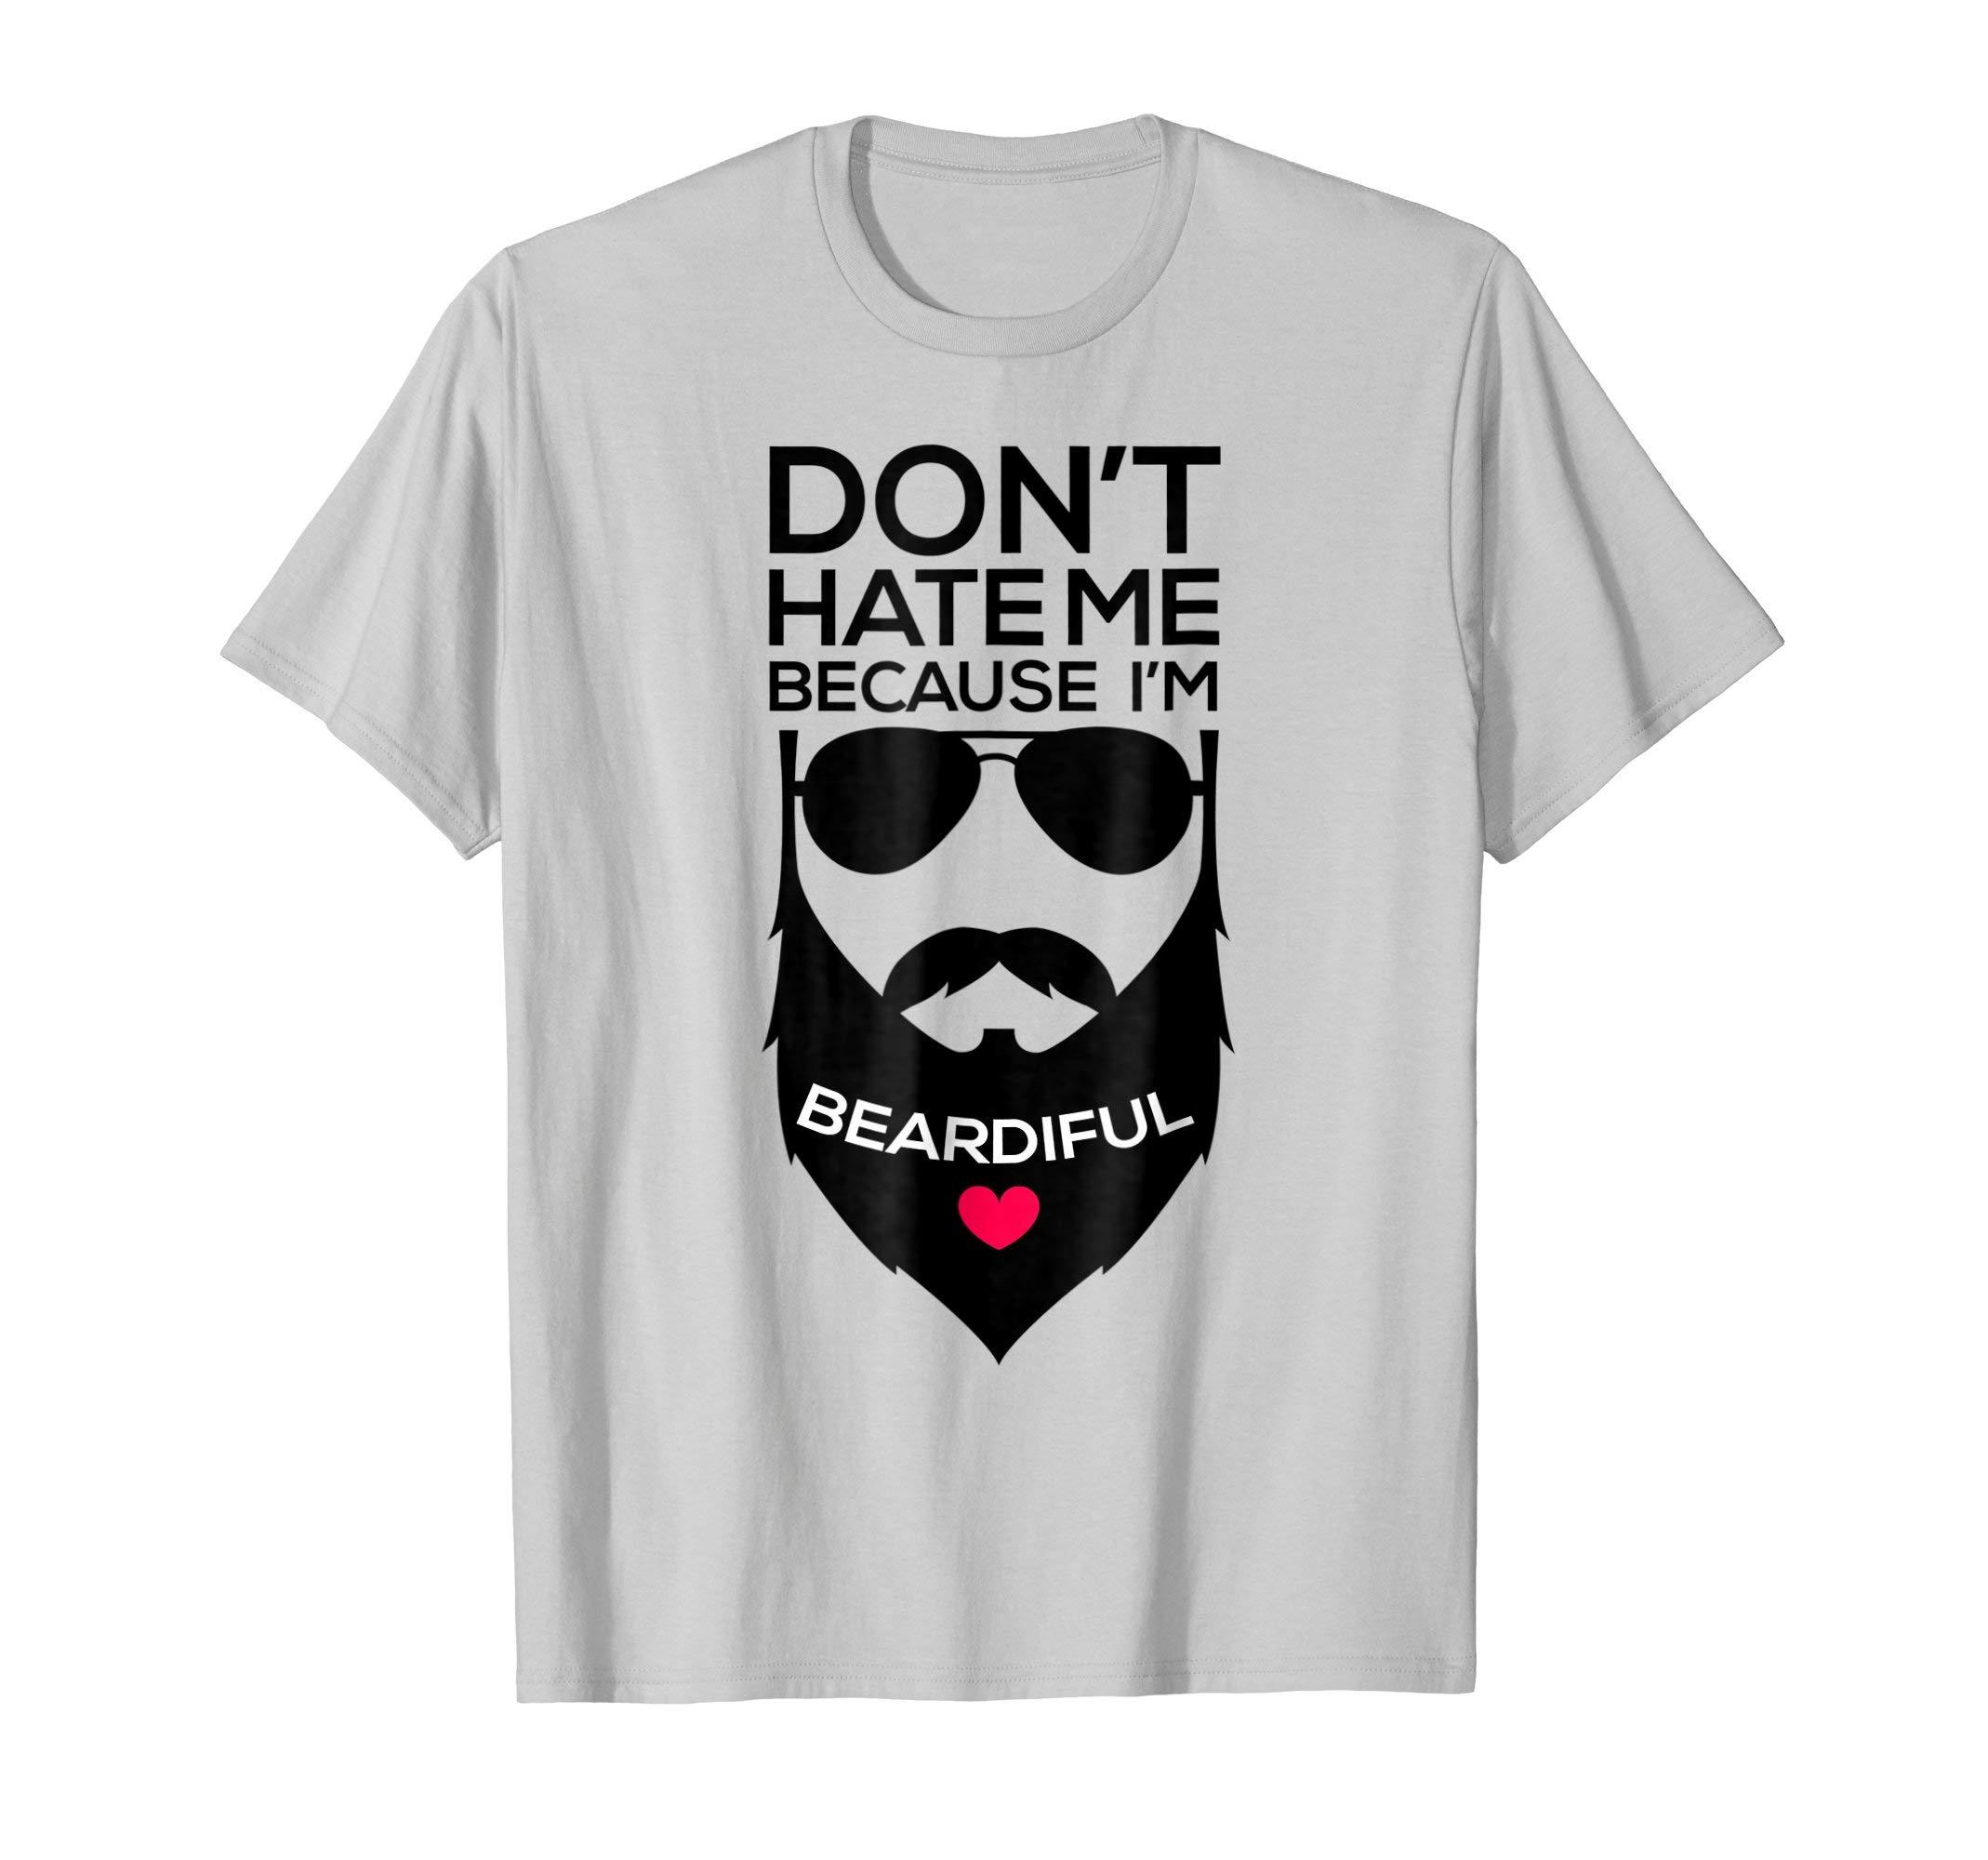 8b4d728f6 Don't Hate Me Because I'm Beardiful Funny Beard T Shirt Men - New ...